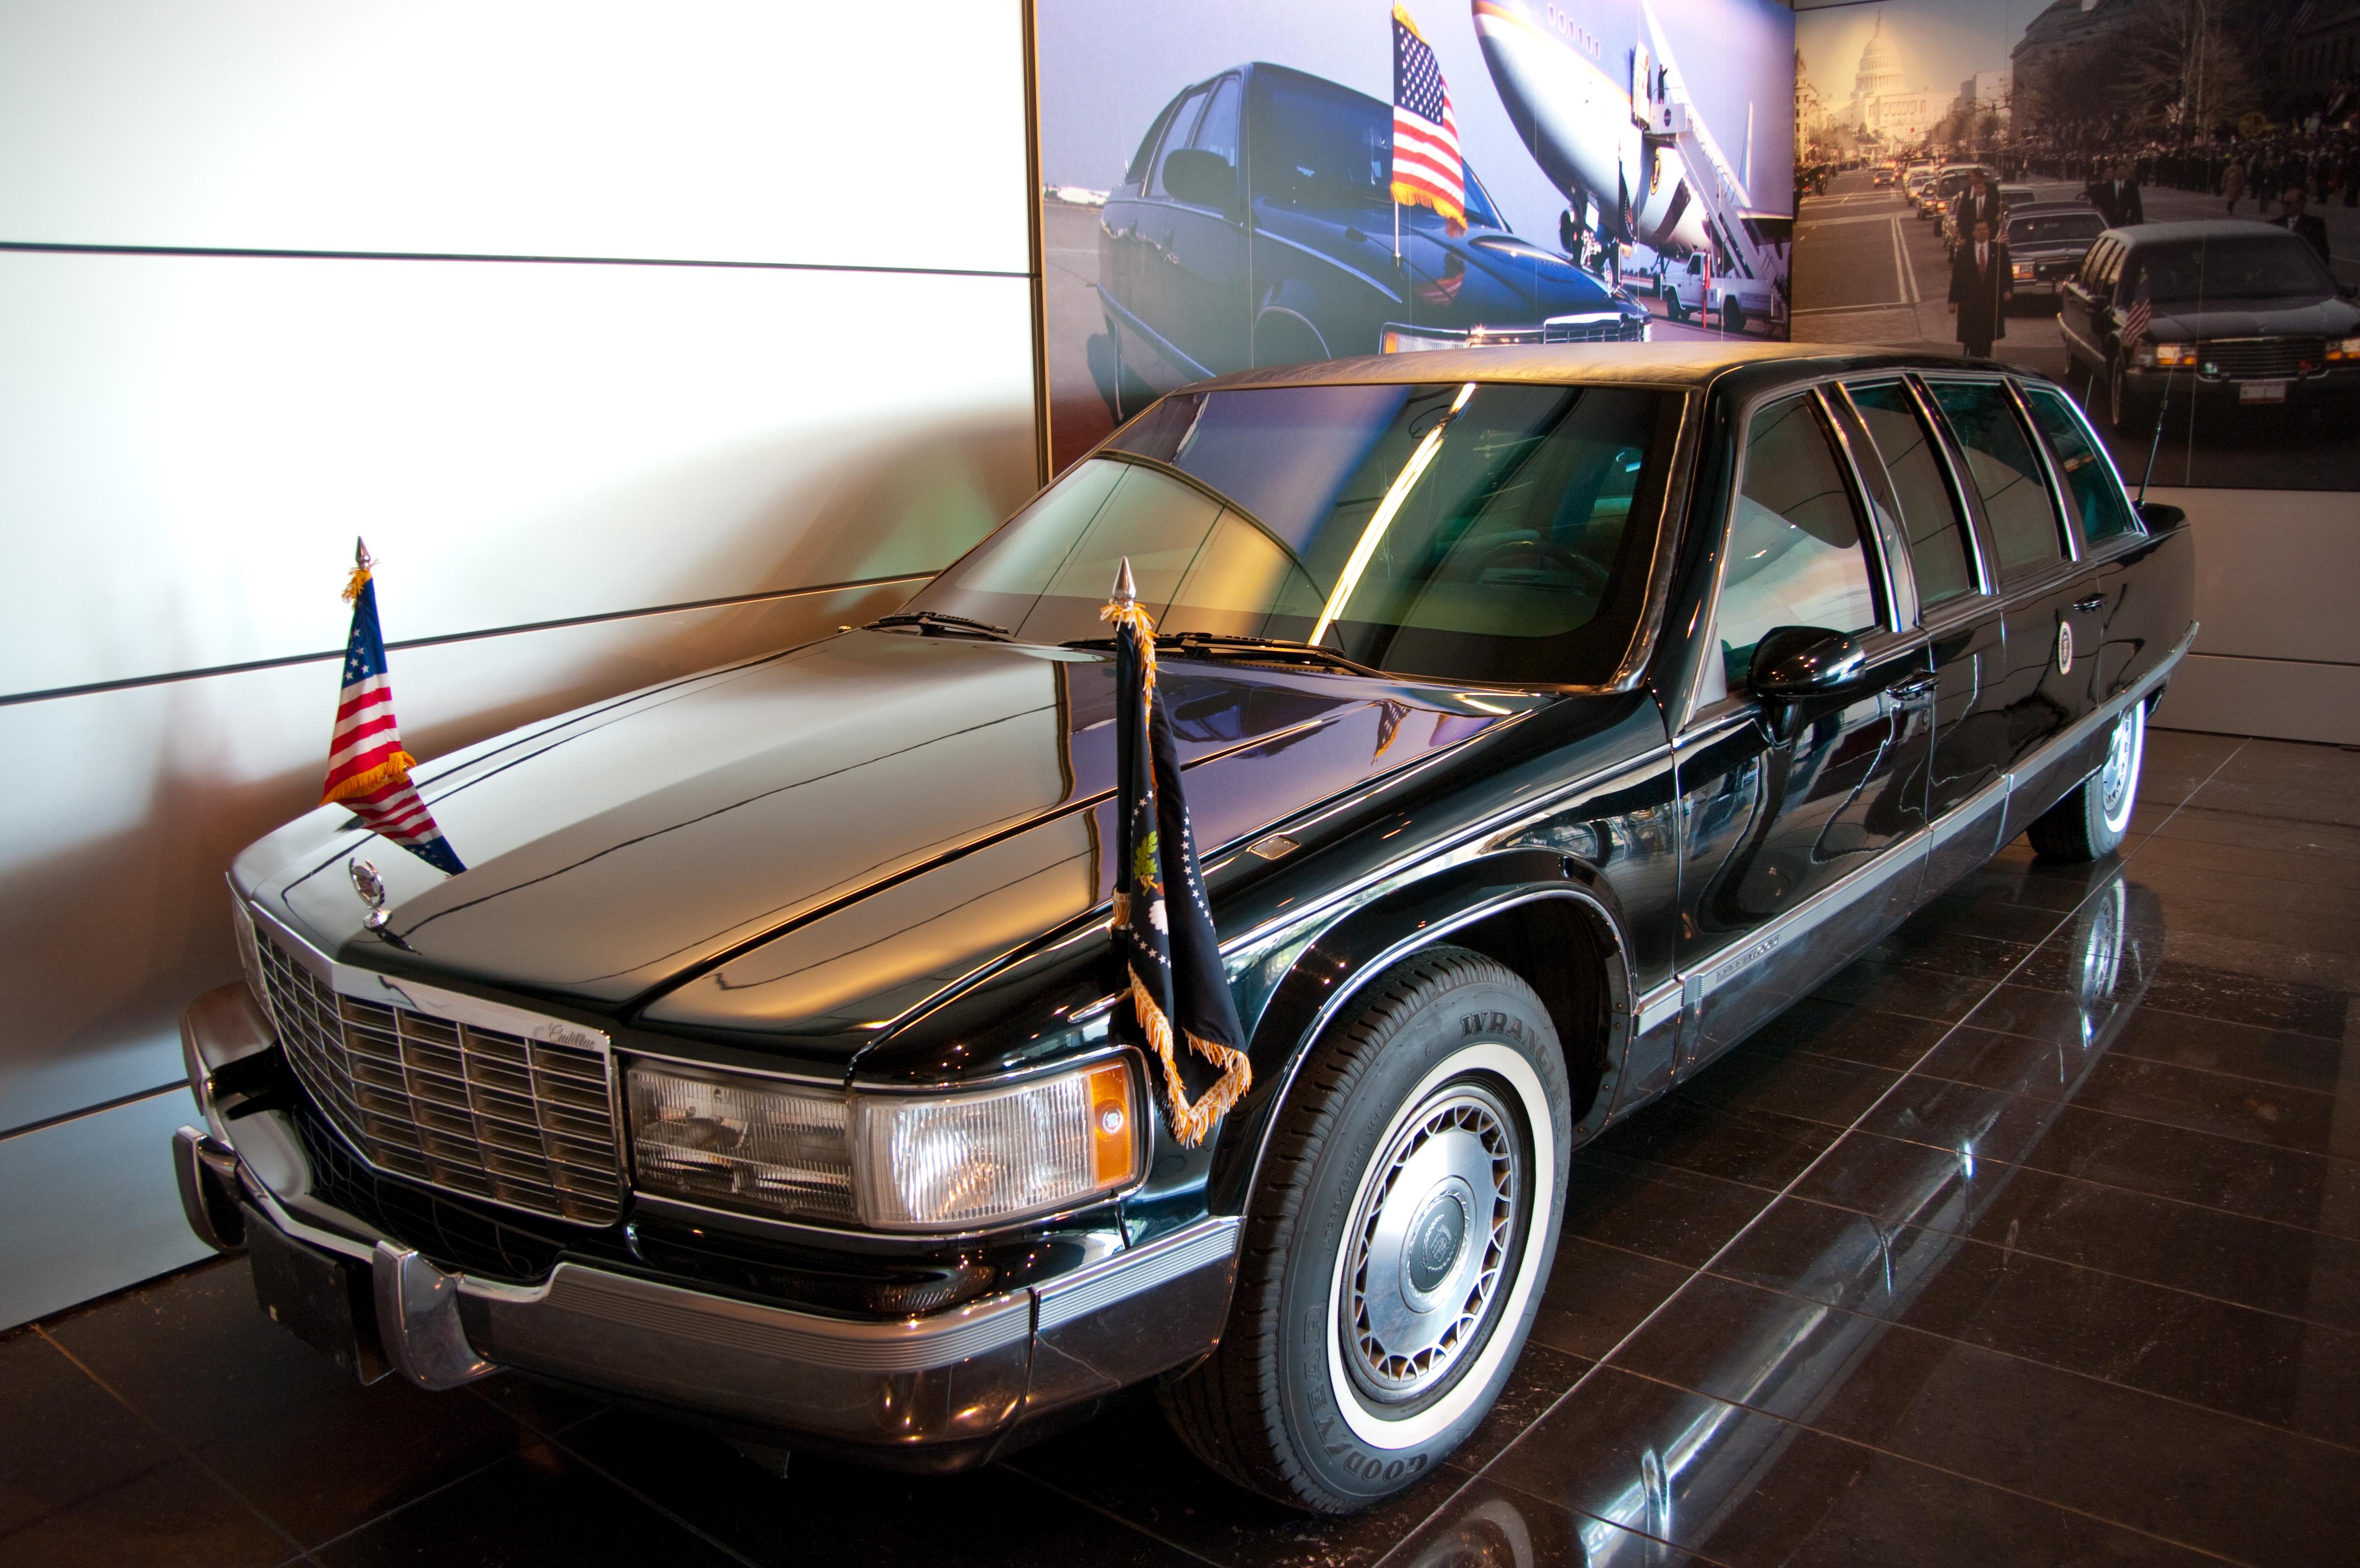 Road Trip: Clinton Library, Arkansas, Car, Clinton, History, HQ Photo